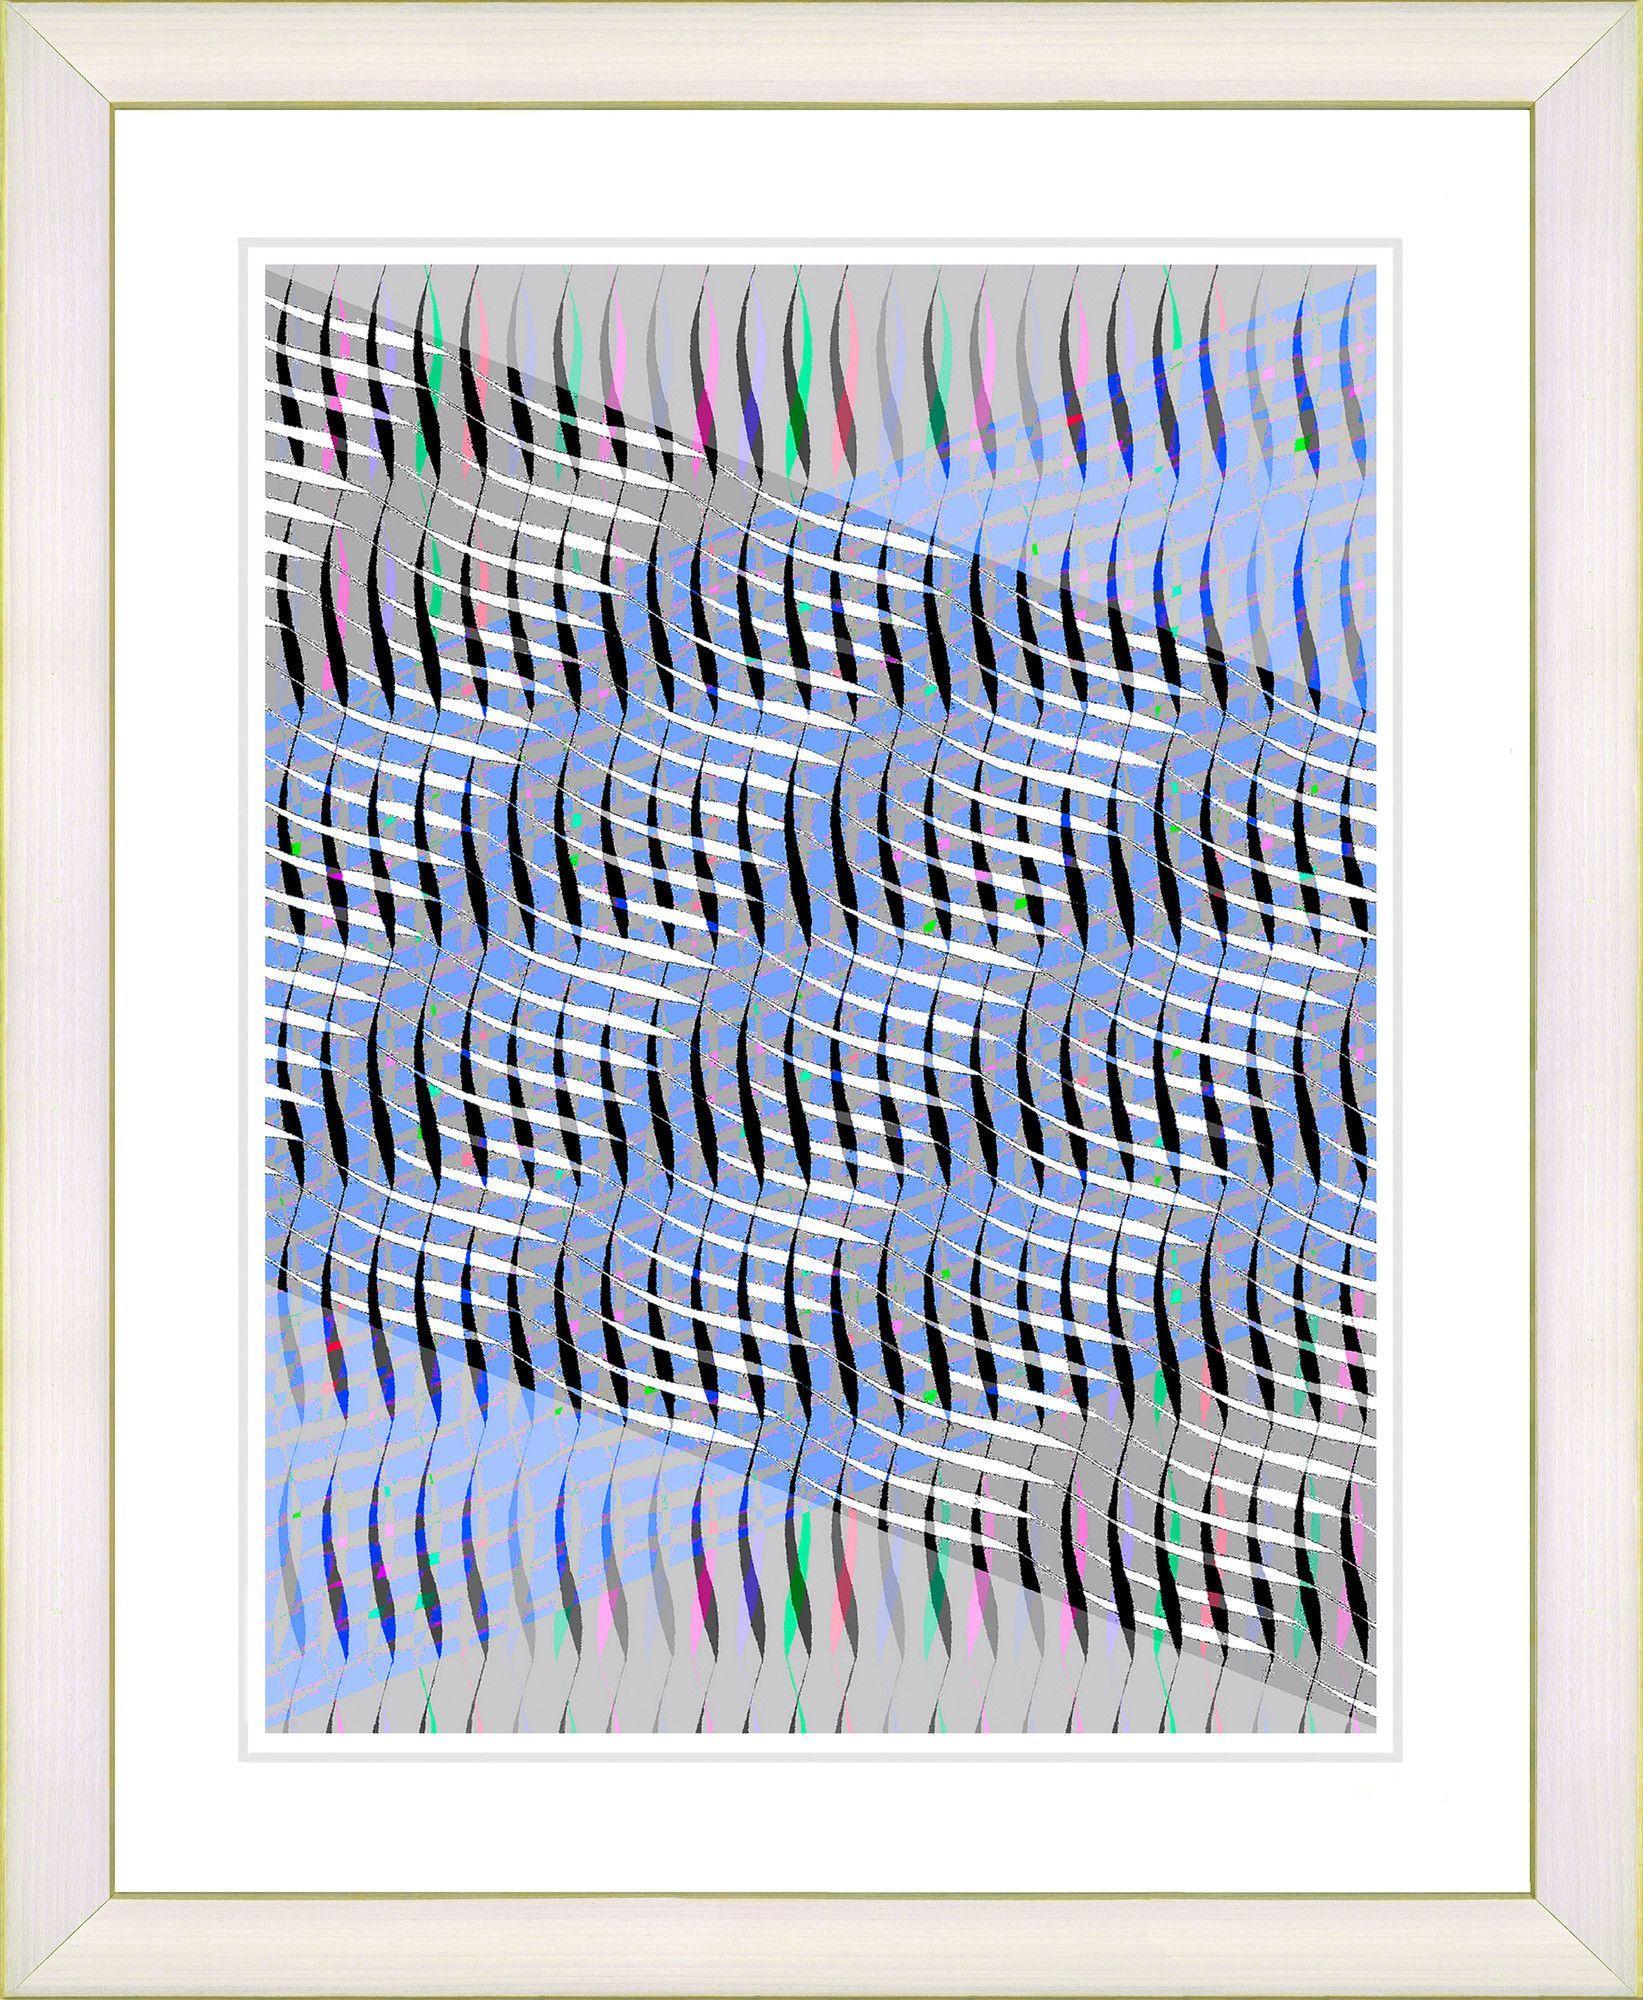 Pastel placidus blue by zhee singer framed fine art giclee